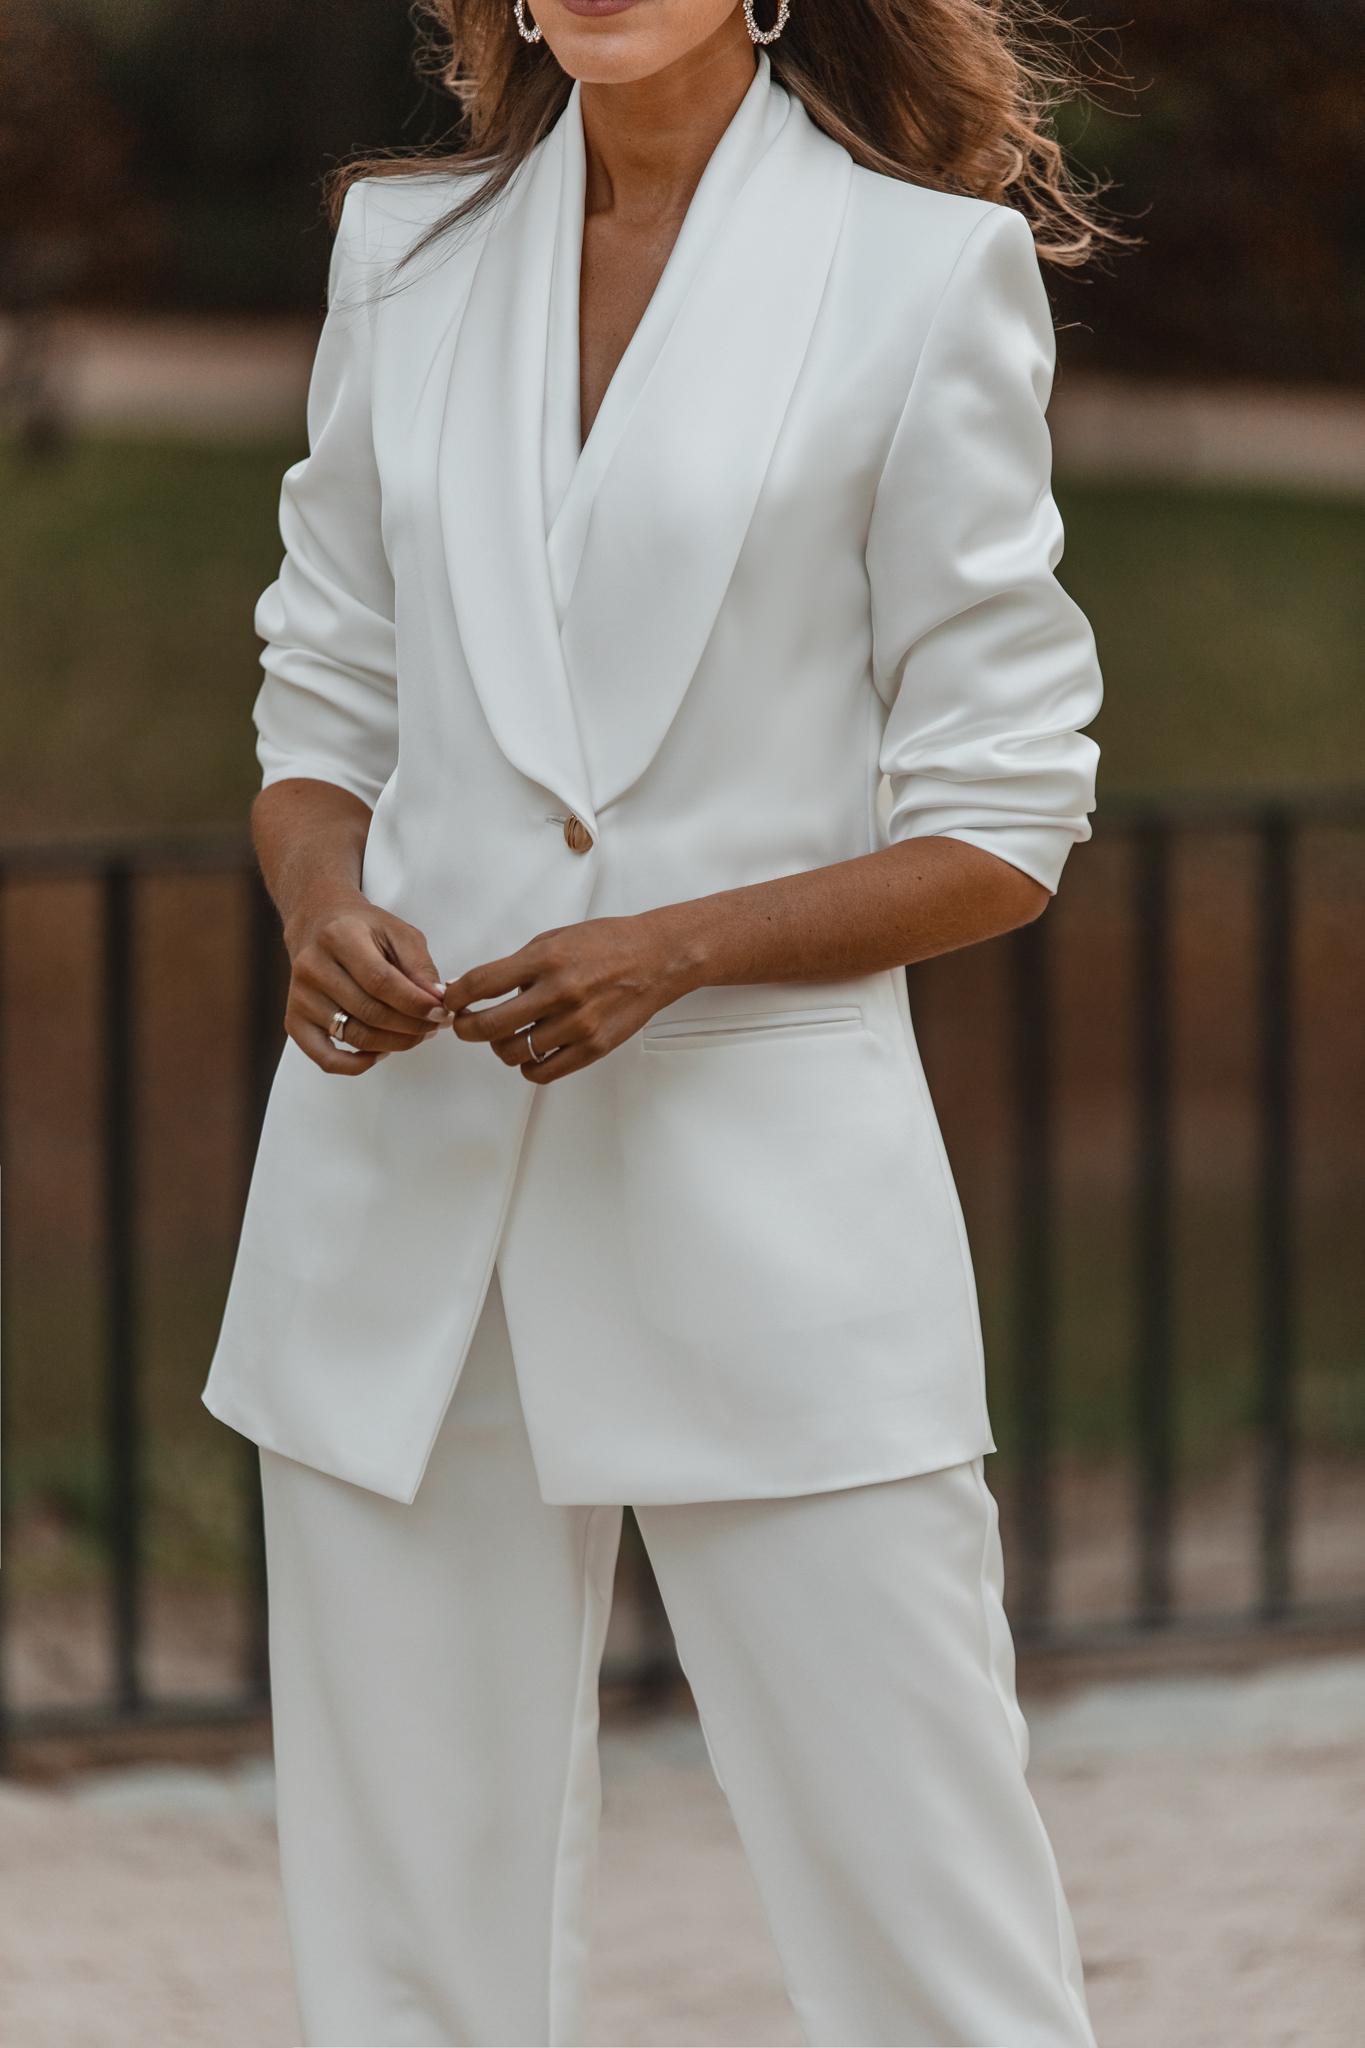 traje chaqueta blanco novia comunion